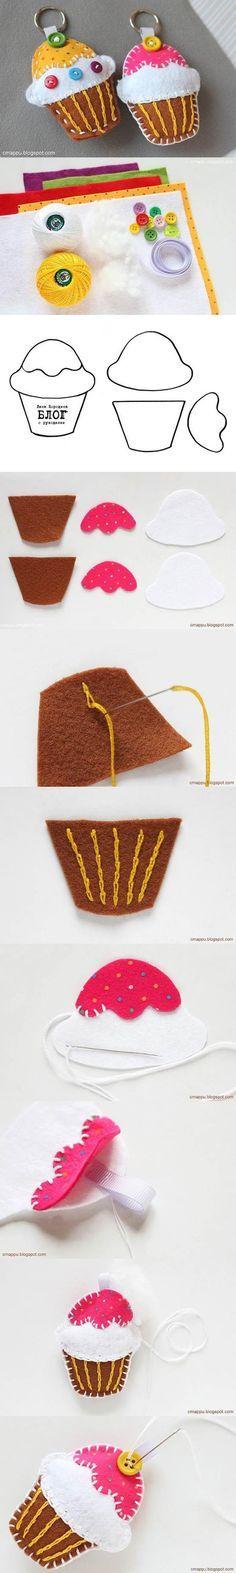 DIY Felt Cupcake Key Chain | iCreativeIdeas.com LIKE Us on Facebook == https://www.facebook.com/icreativeideas